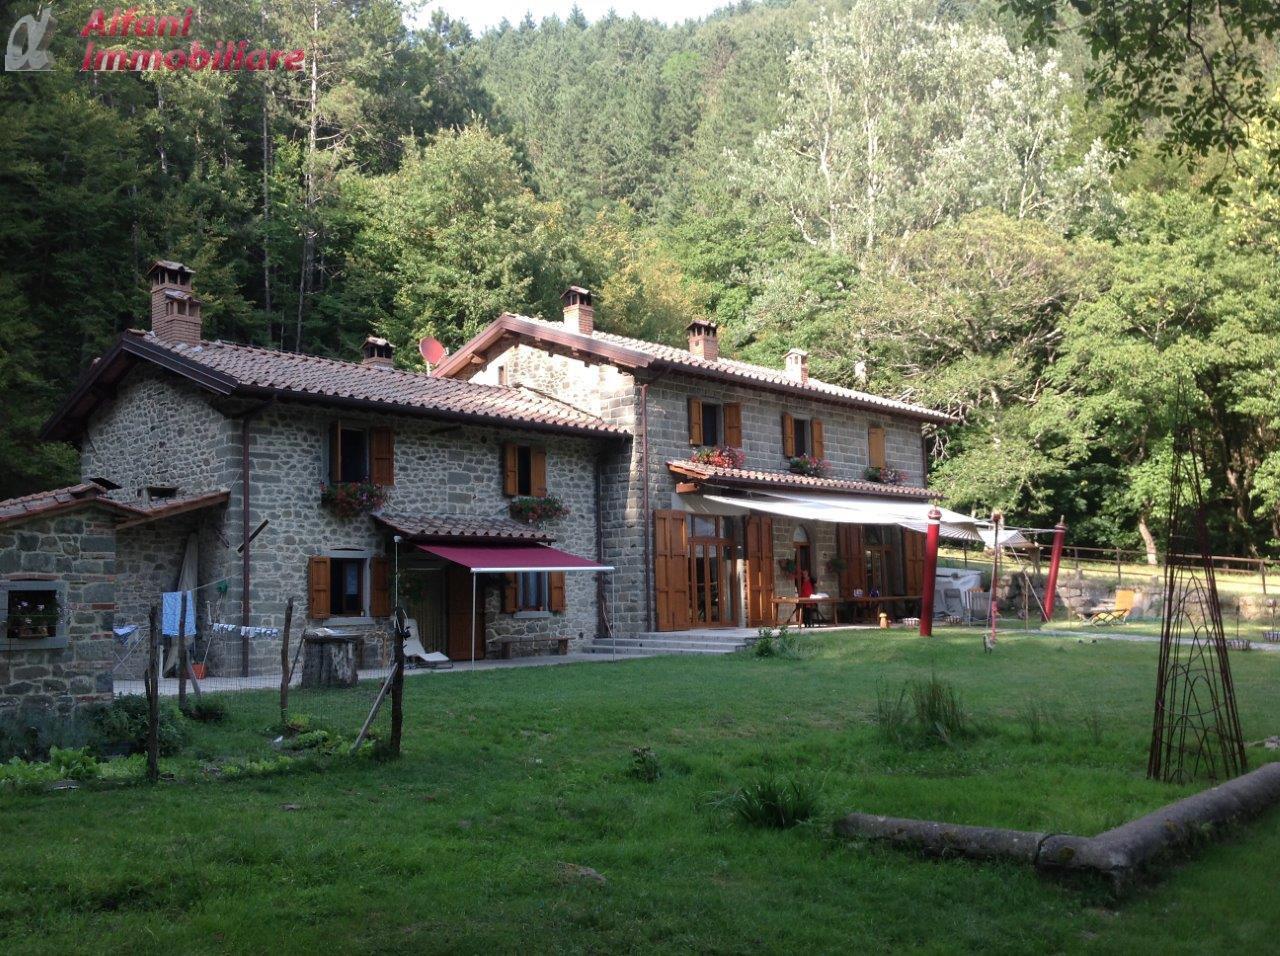 Casa Vacanze STIA 504C